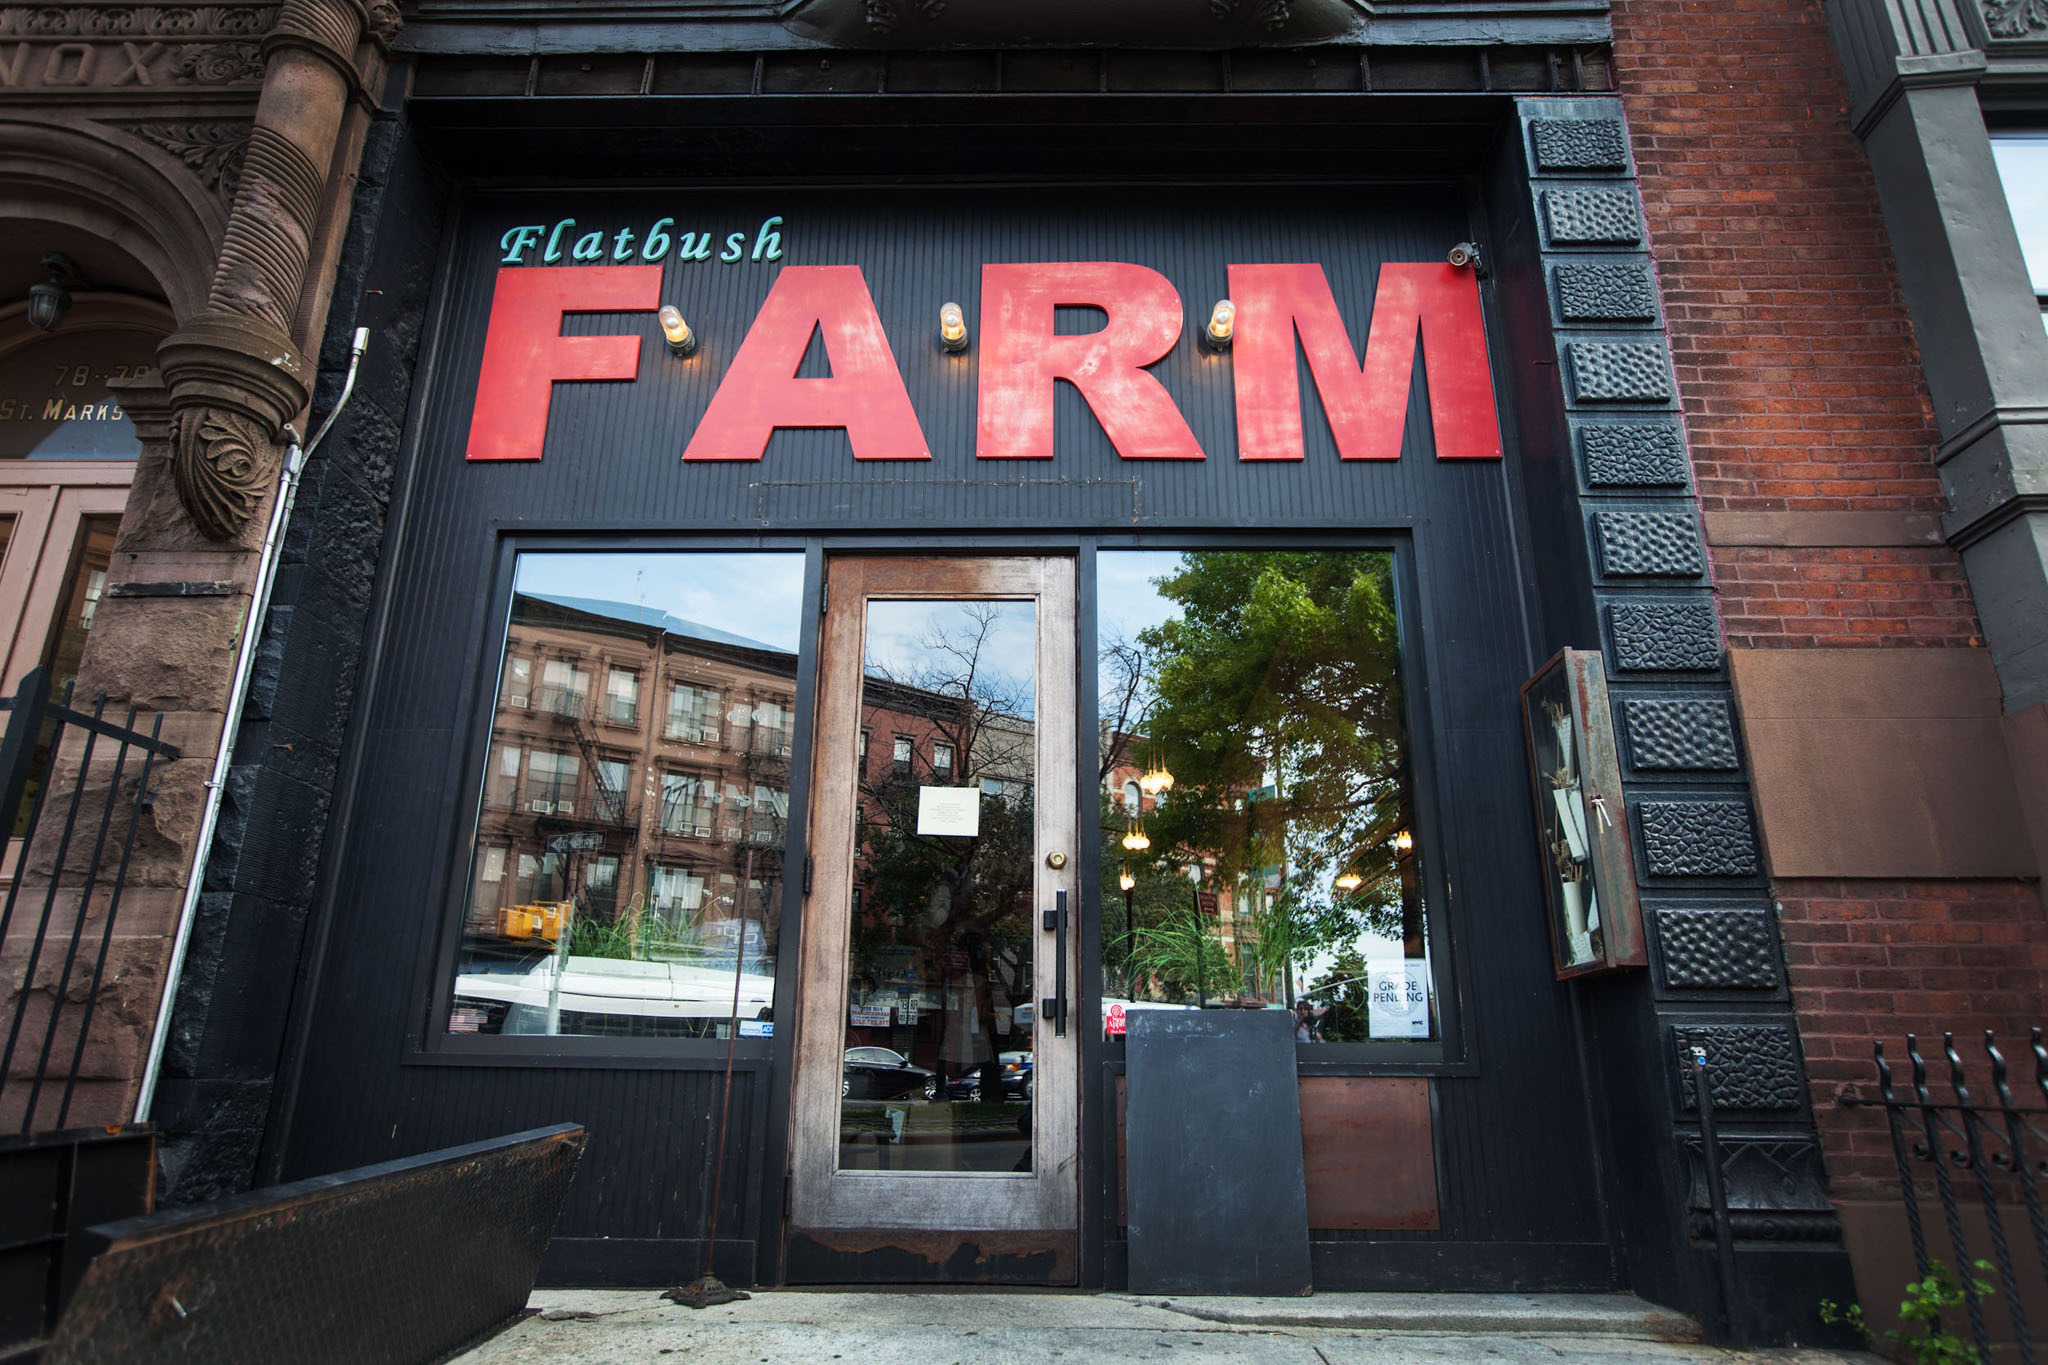 Flatbush Farm